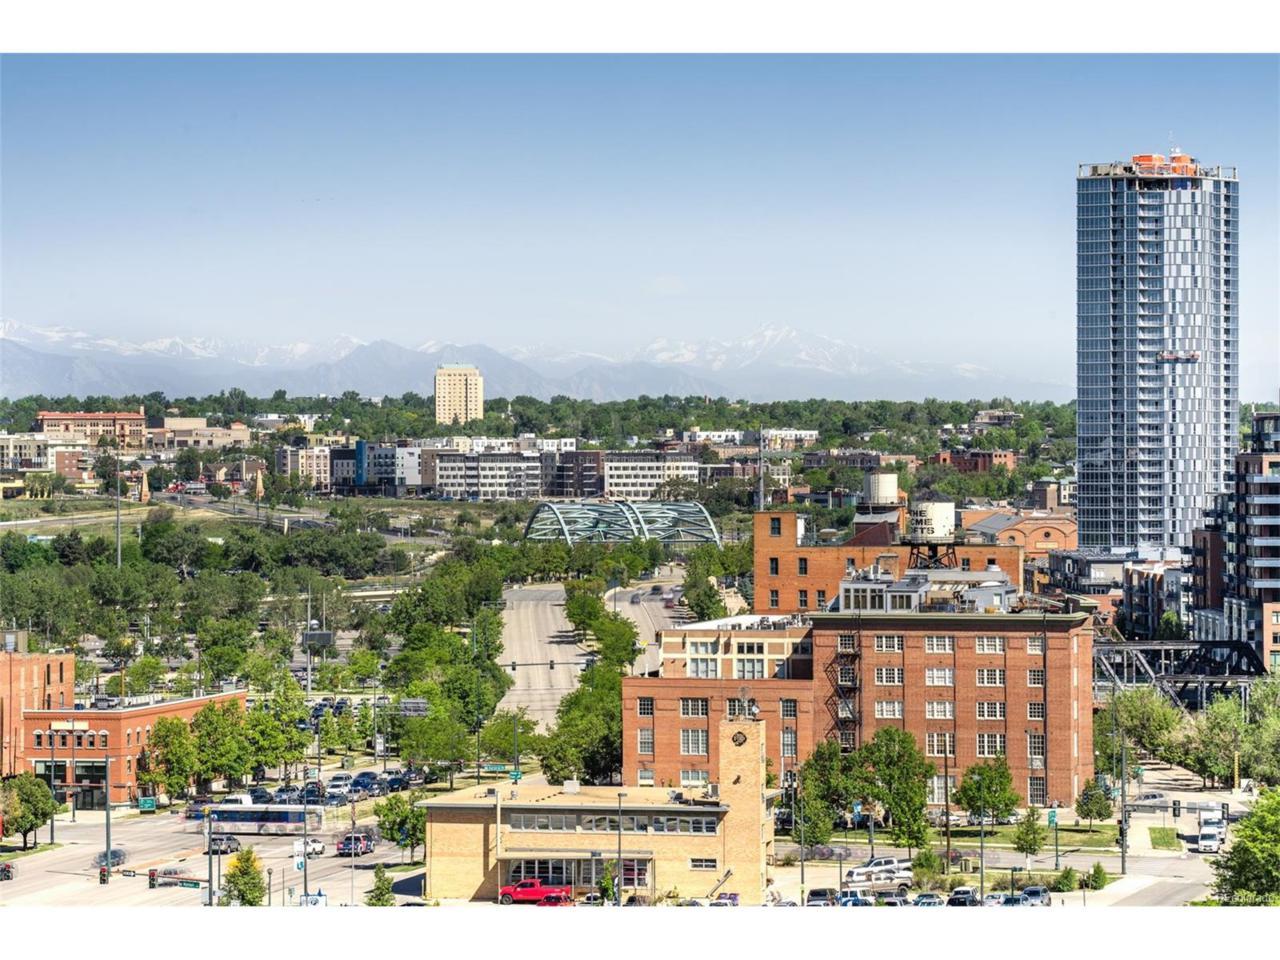 1350 Lawrence Street Pha, Denver, CO 80204 (MLS #2381659) :: 8z Real Estate